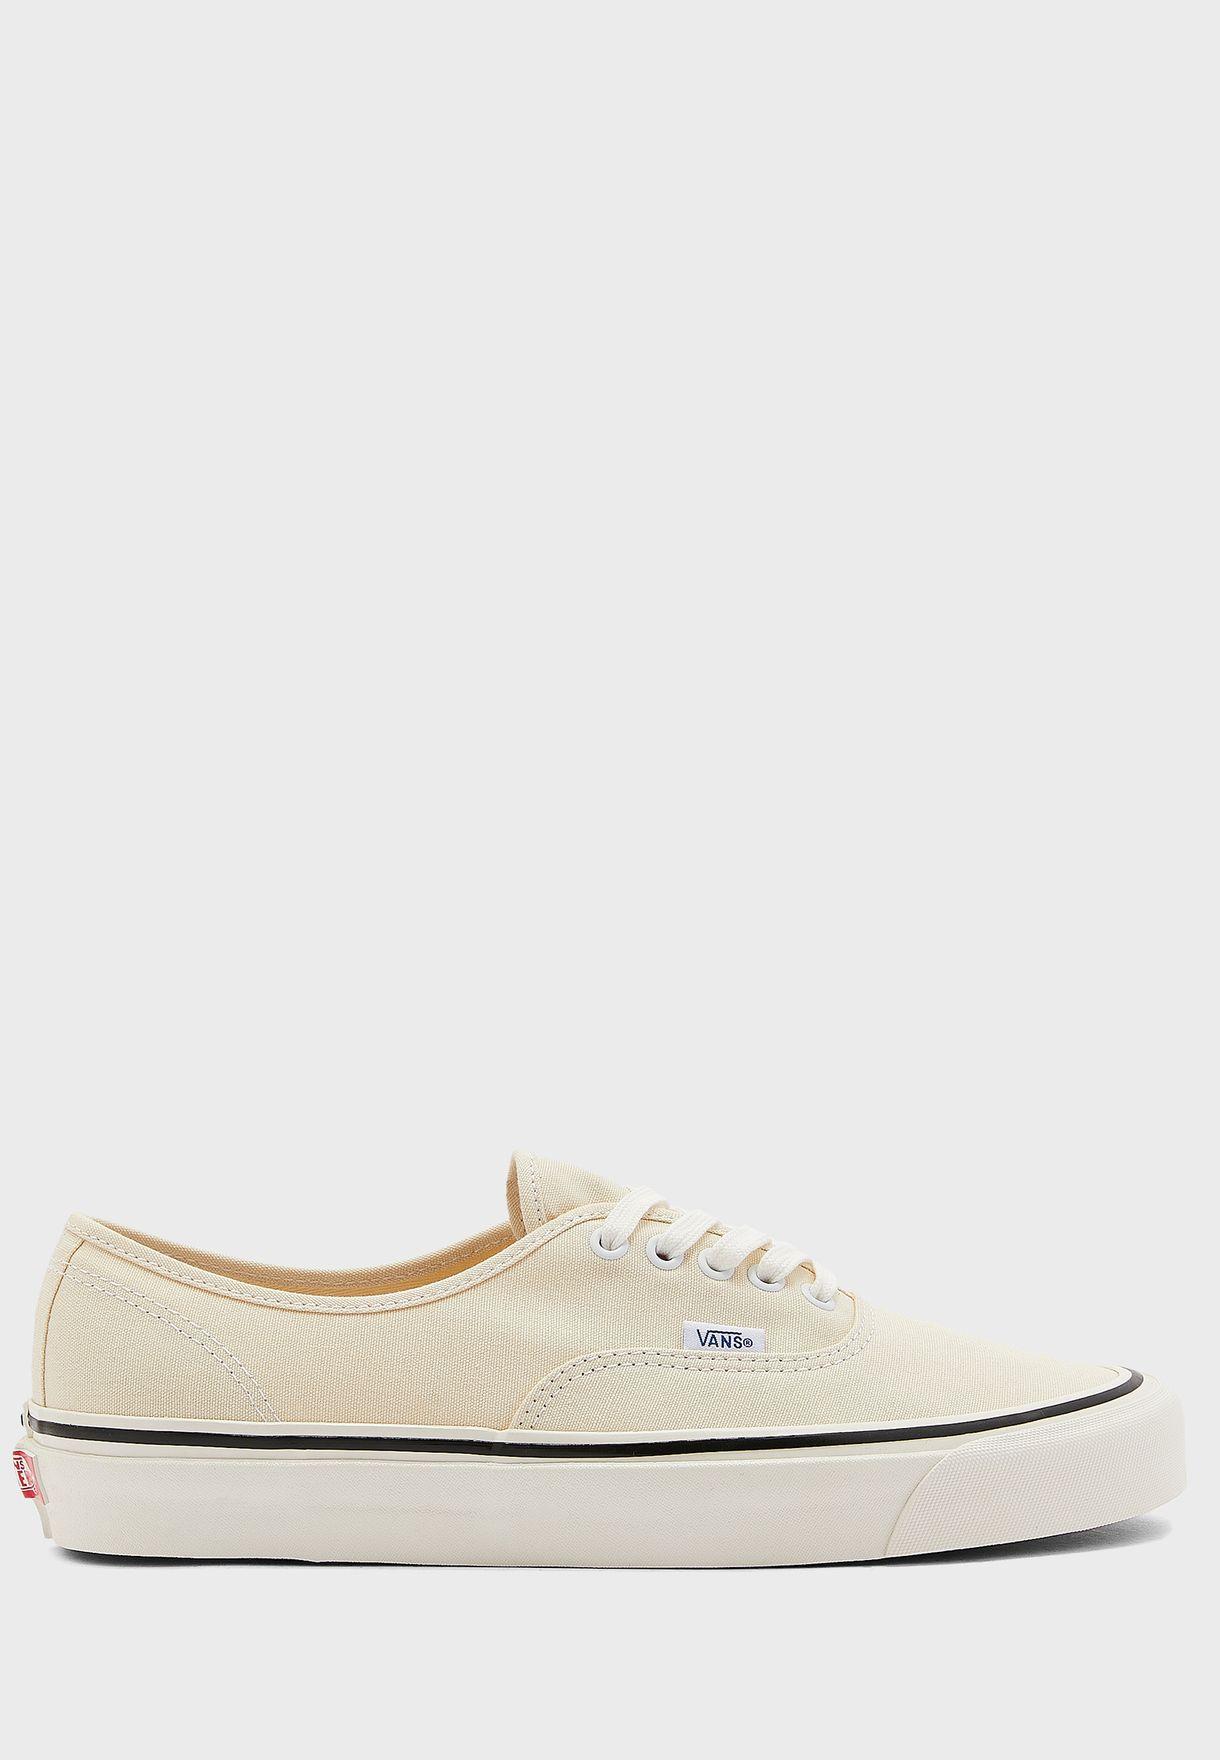 Shop Vans white Authentic 44 DX Sneakers 8ENMR4 for Women in UAE ... c35b02bc4